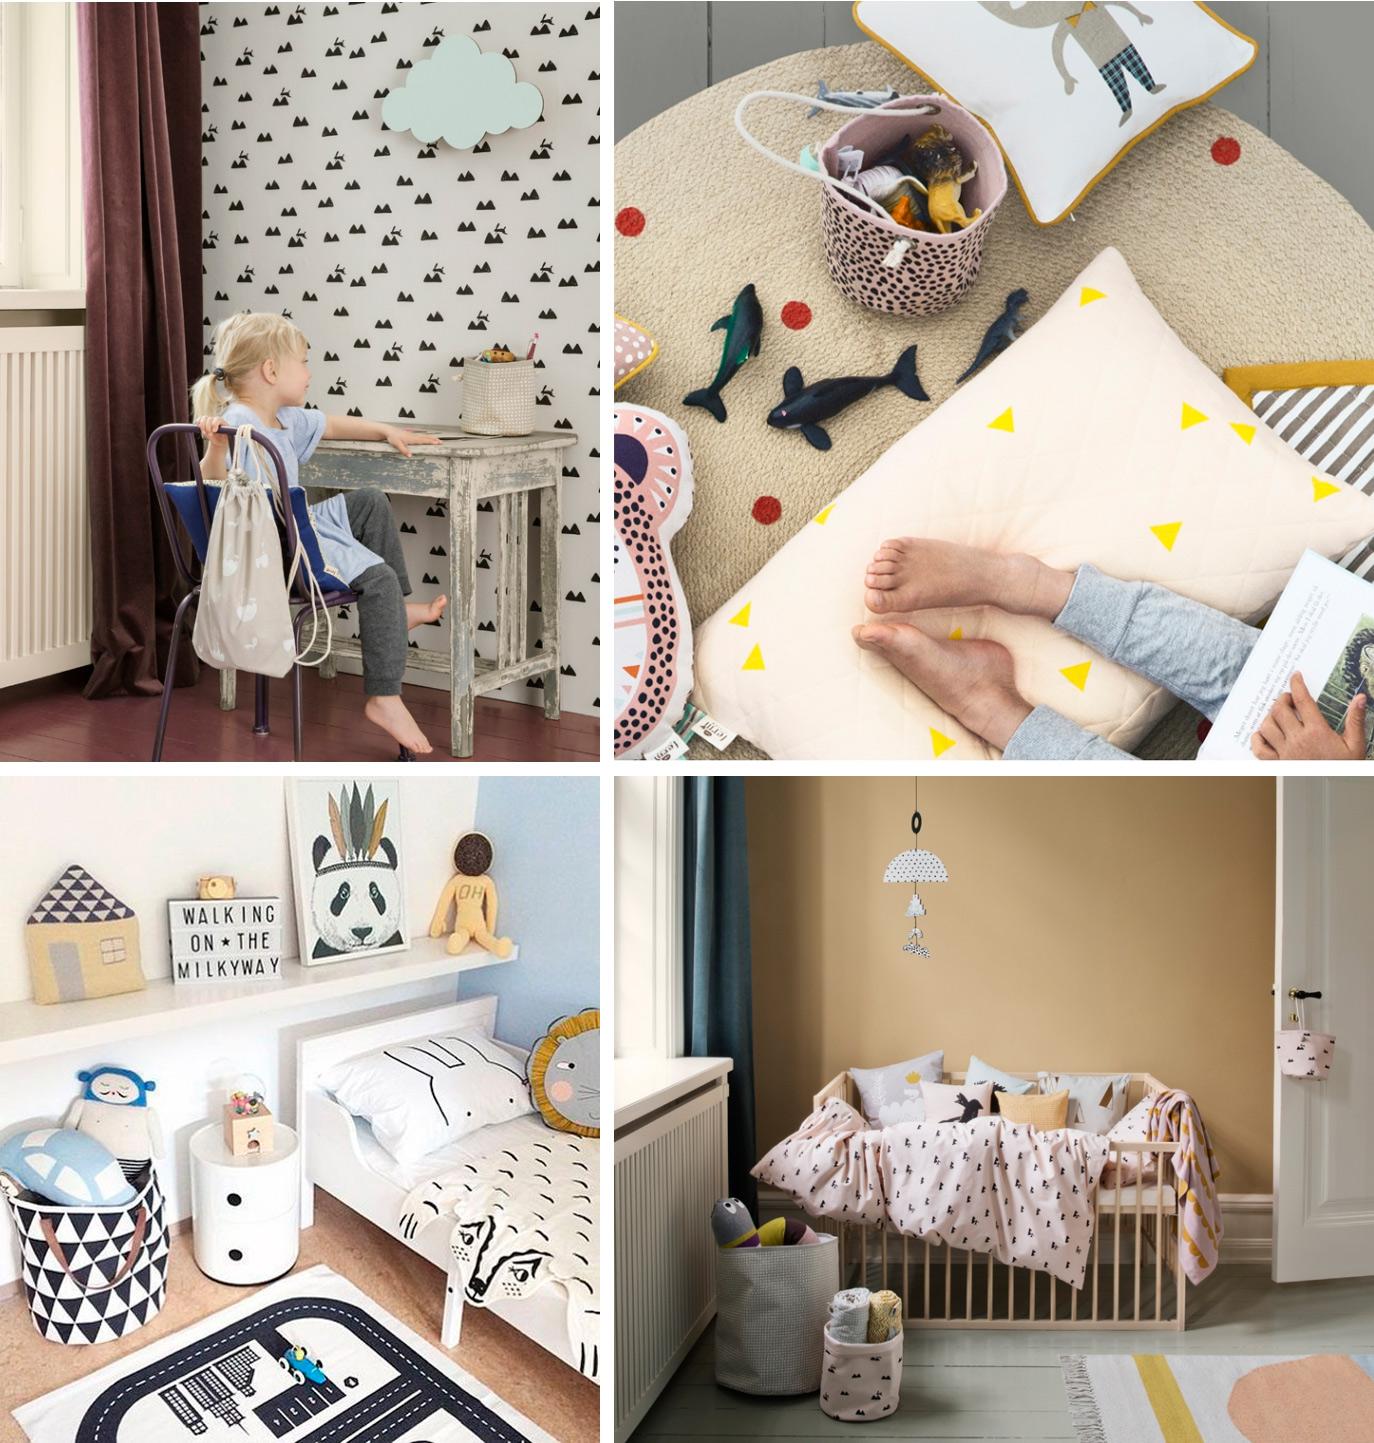 Cestas-almacenamiento-dormitorio-infantil